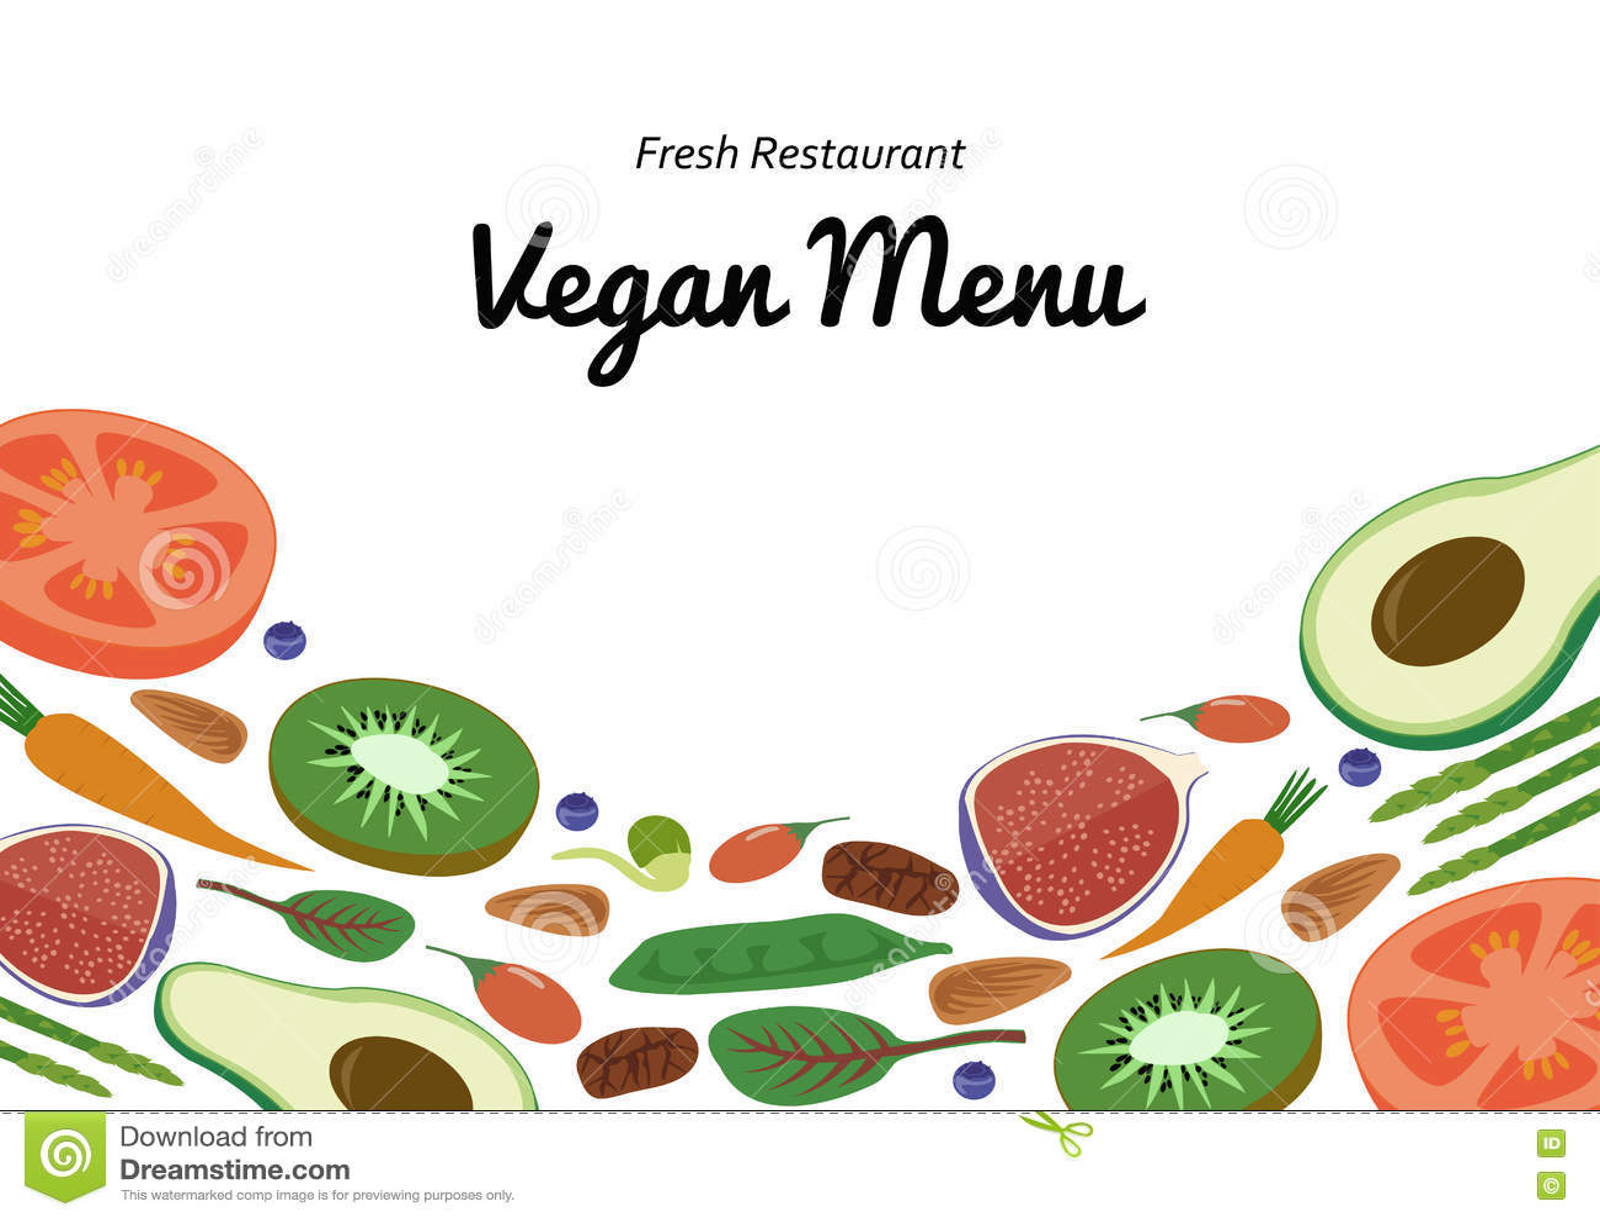 vegan restaurant cafe menu superfood vegetable fruit template